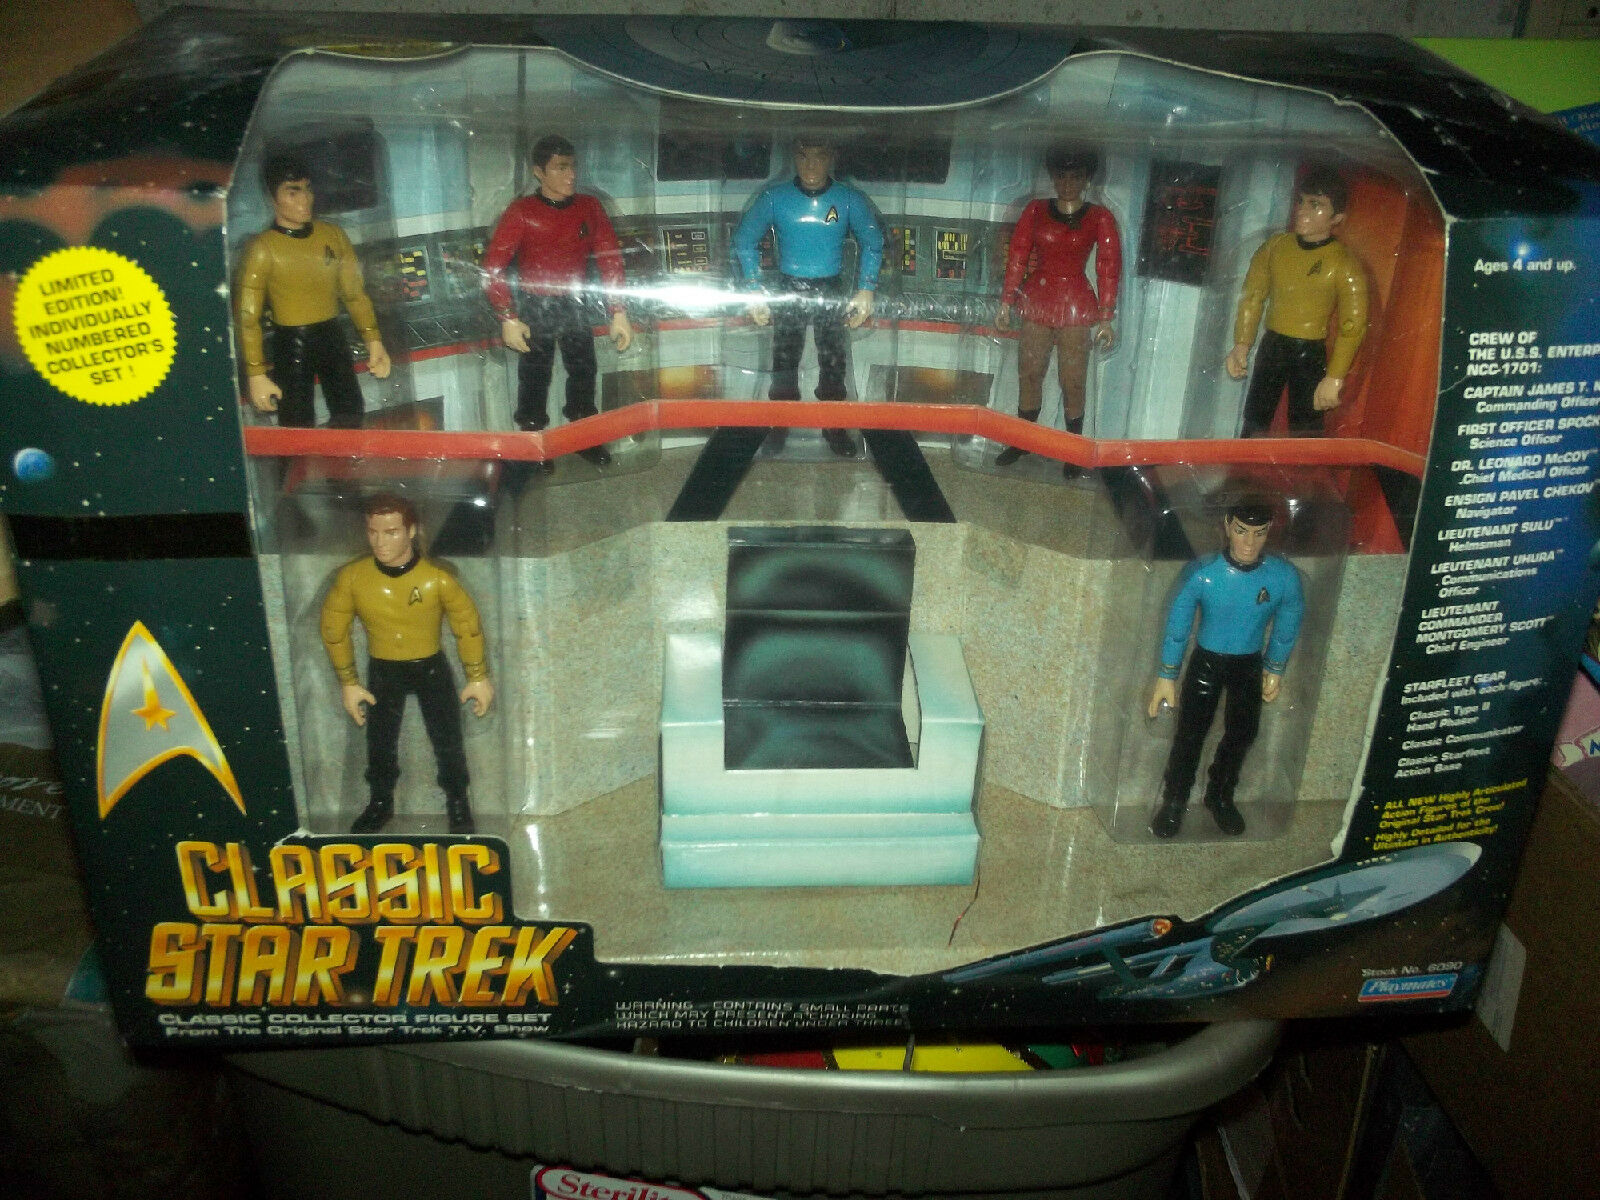 Classic Estrella Trek-USS ENTERPRISE BRIDGE NUEVO capitán Kirk & personal Jugarmates